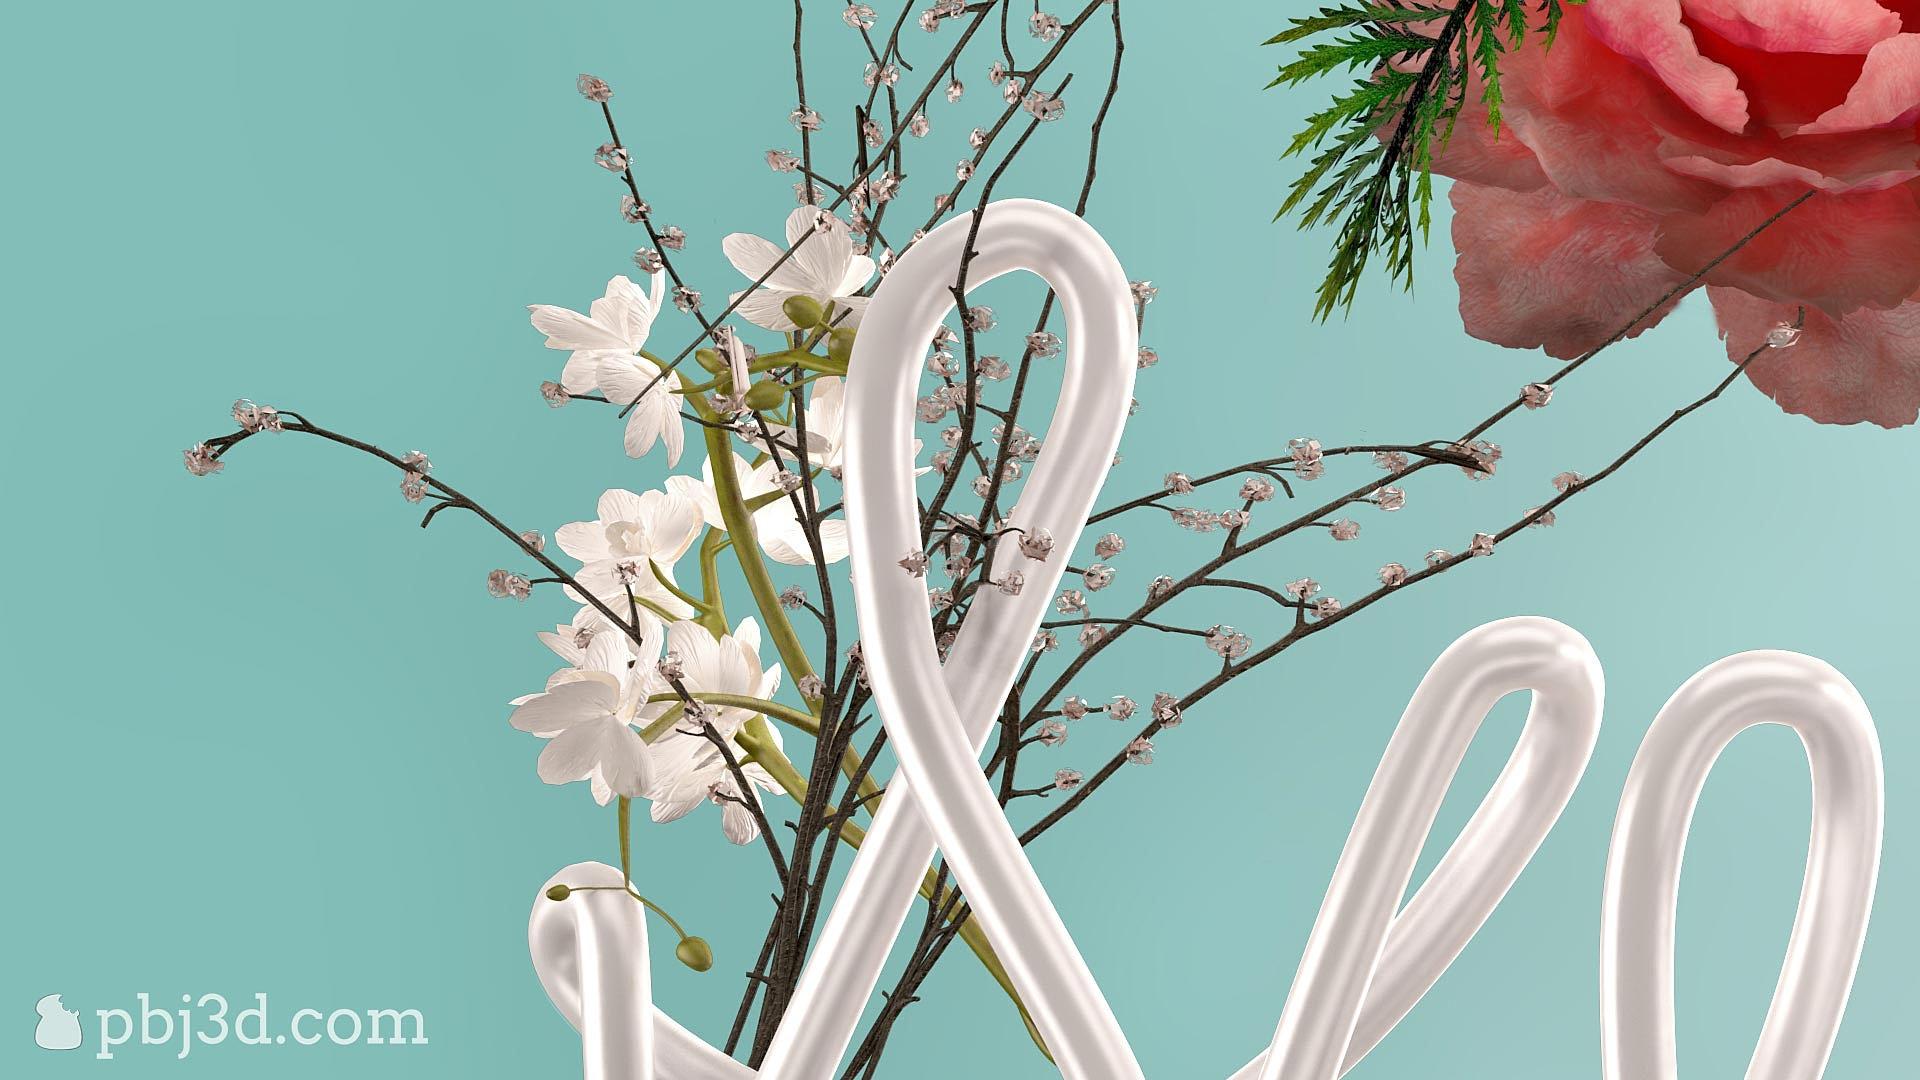 Color art tipografia - 3d Typography Lettering Tipografia Poster Print Art Flowers